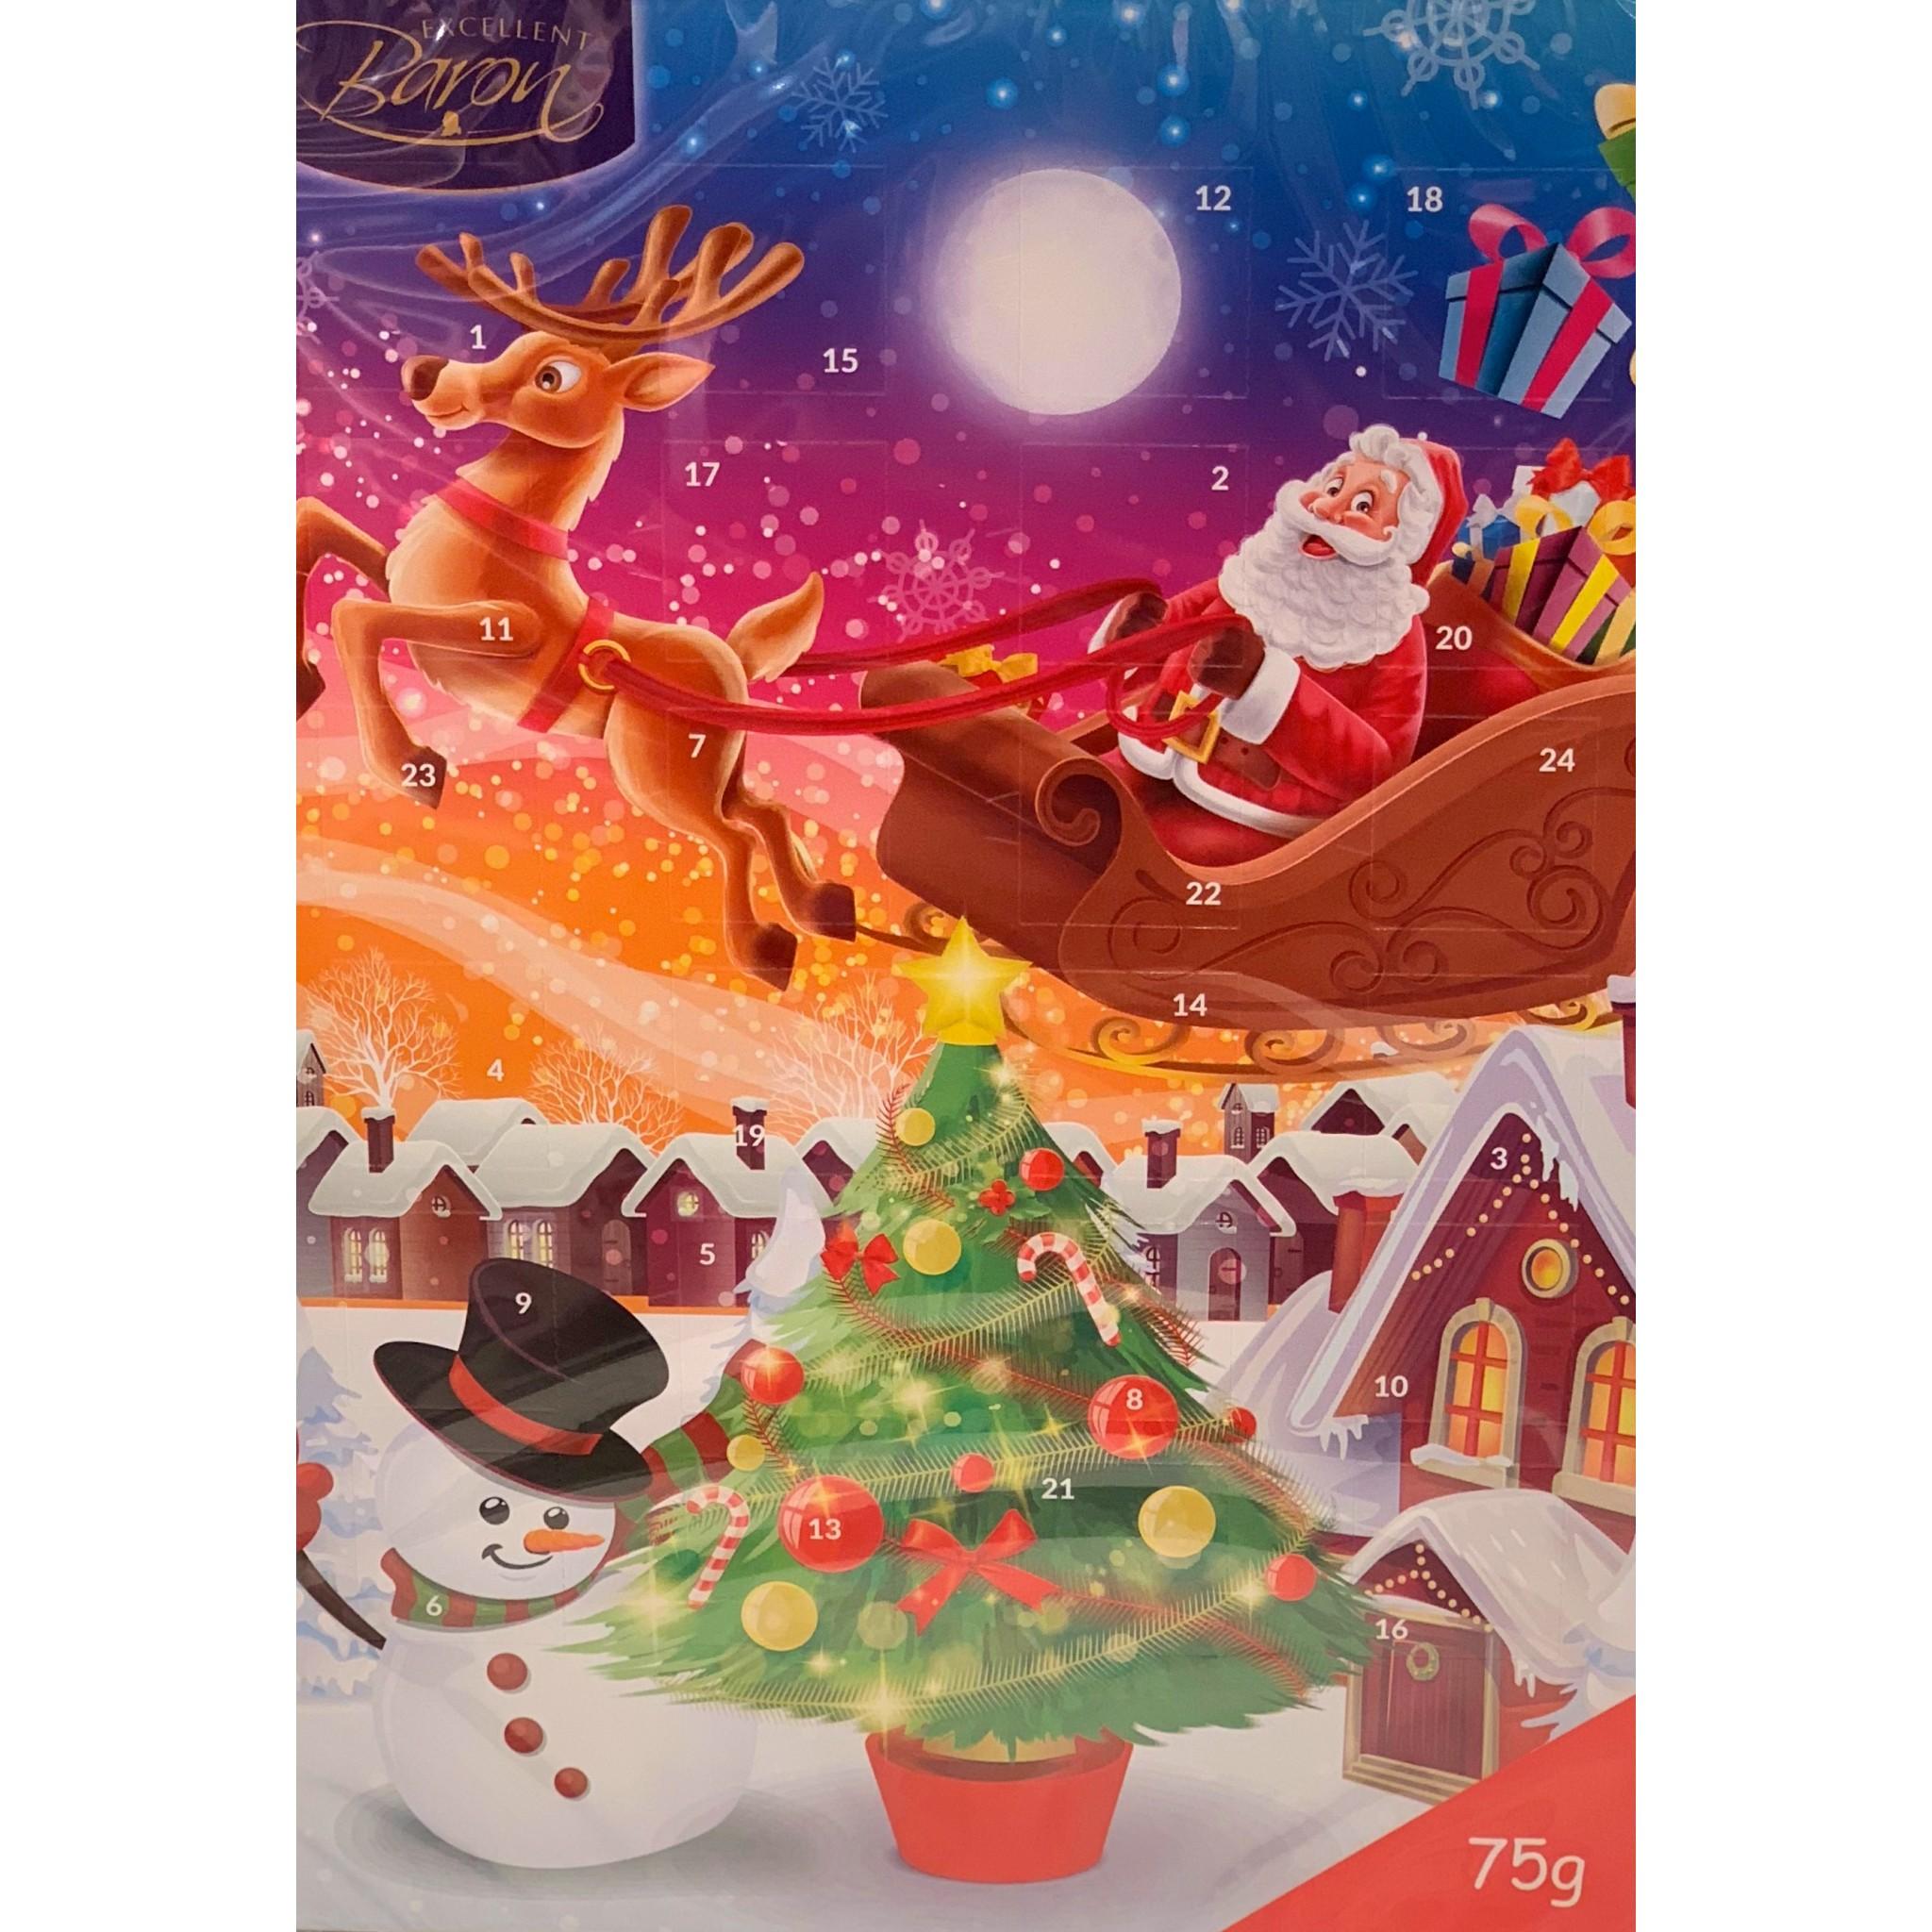 Calendario Avvento Cioccolato.Vendita Online Calendario D Avvento Con Cioccolatini Al